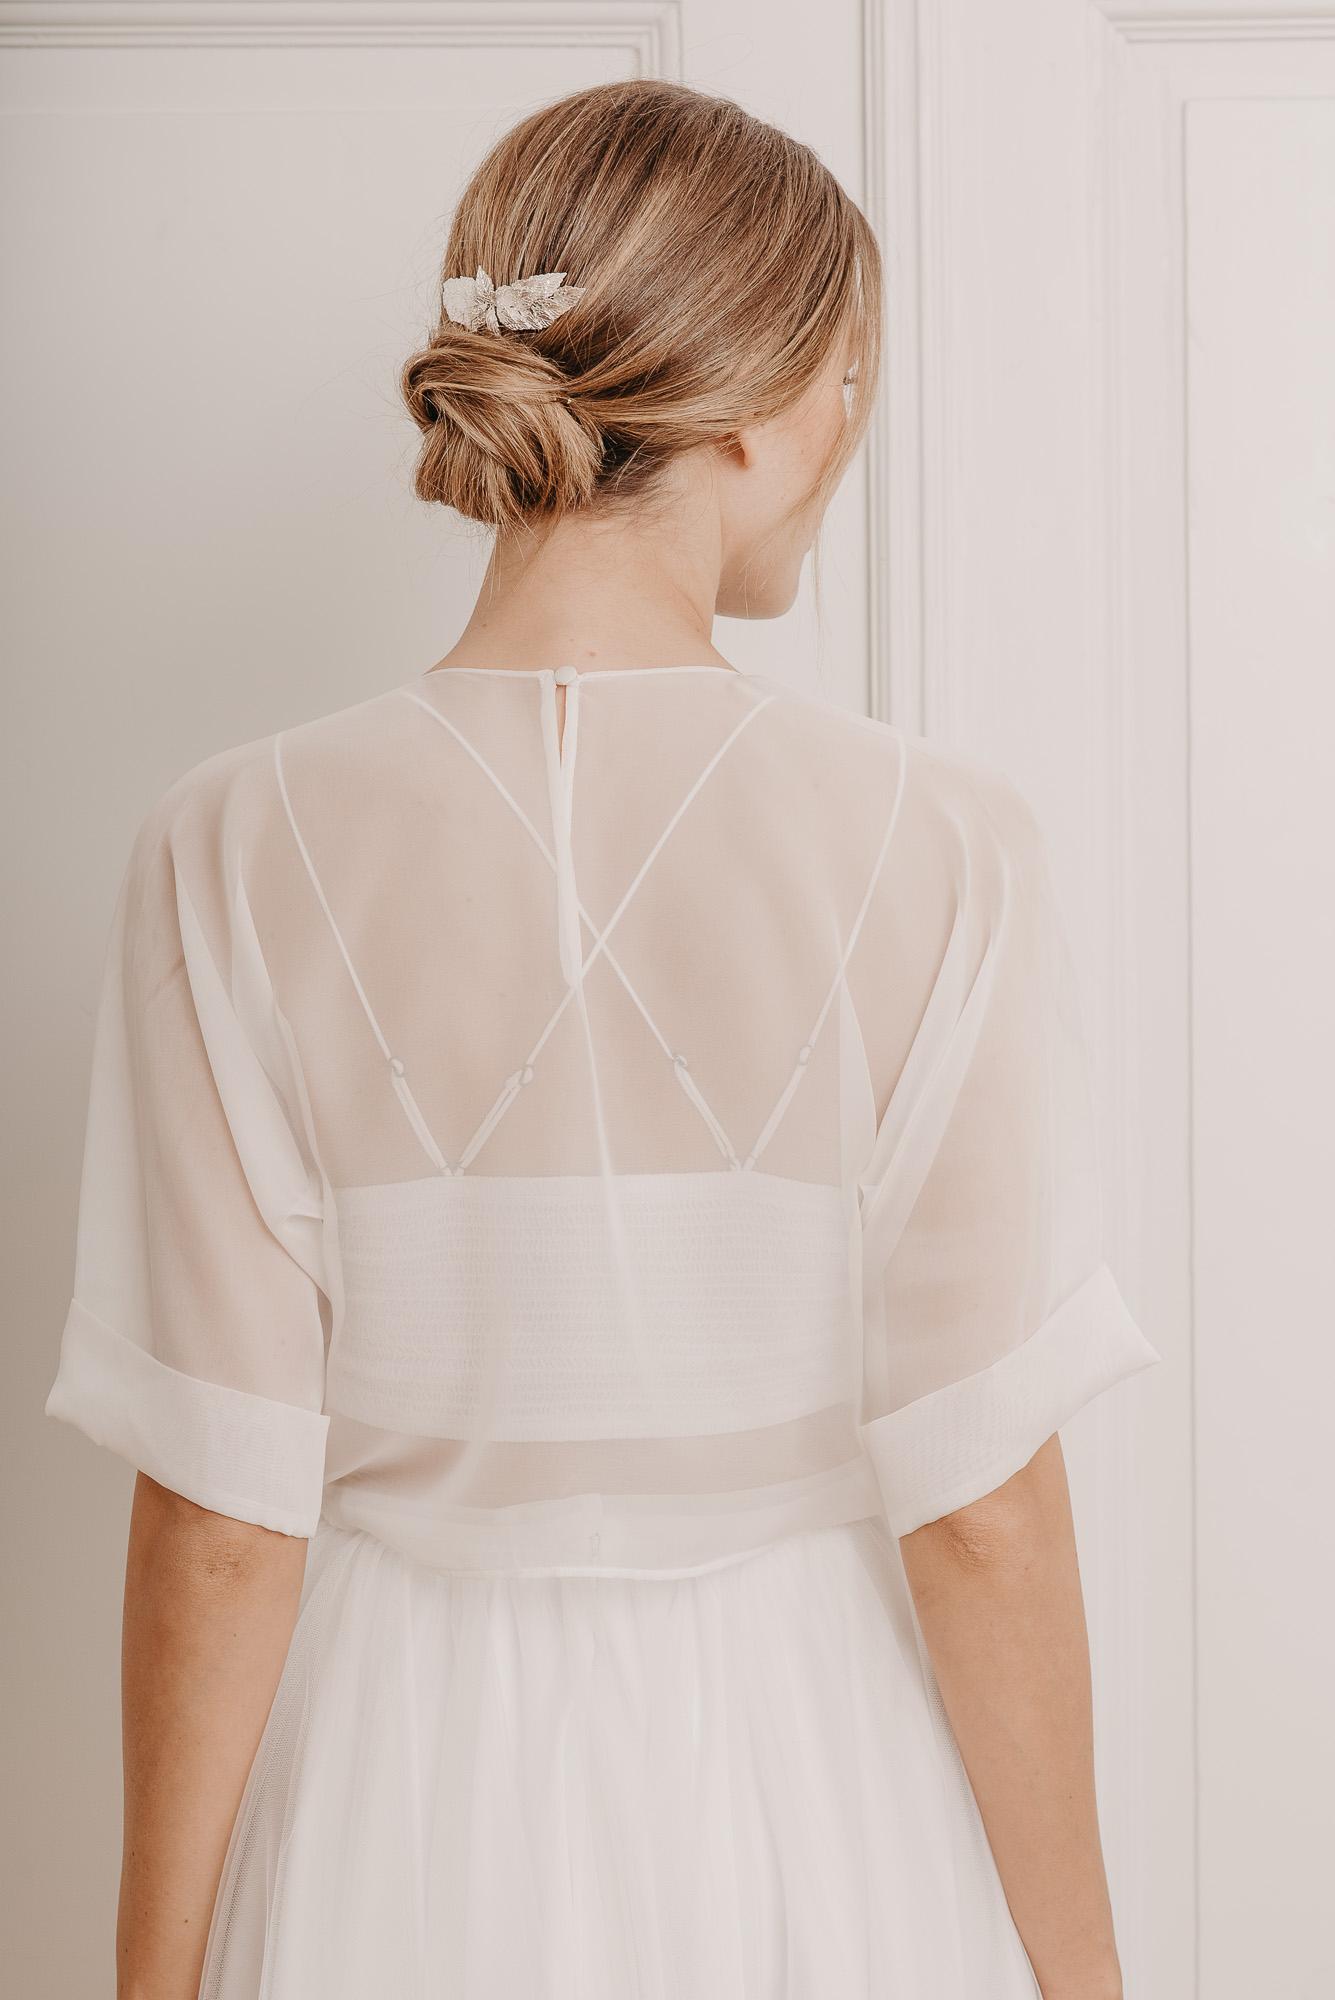 Soft Ash Seidenshirt Hinten - Mix & Match Brautmode von Oonce